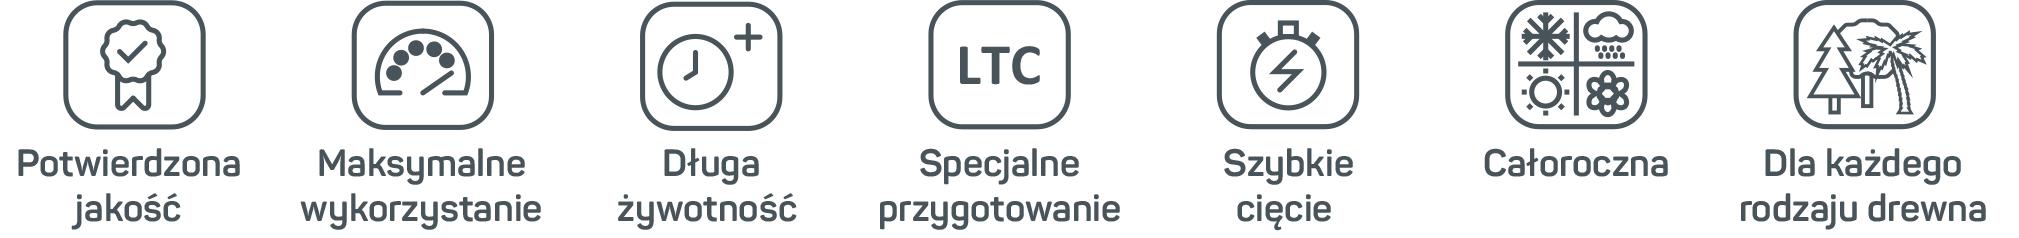 metaforce pictograme